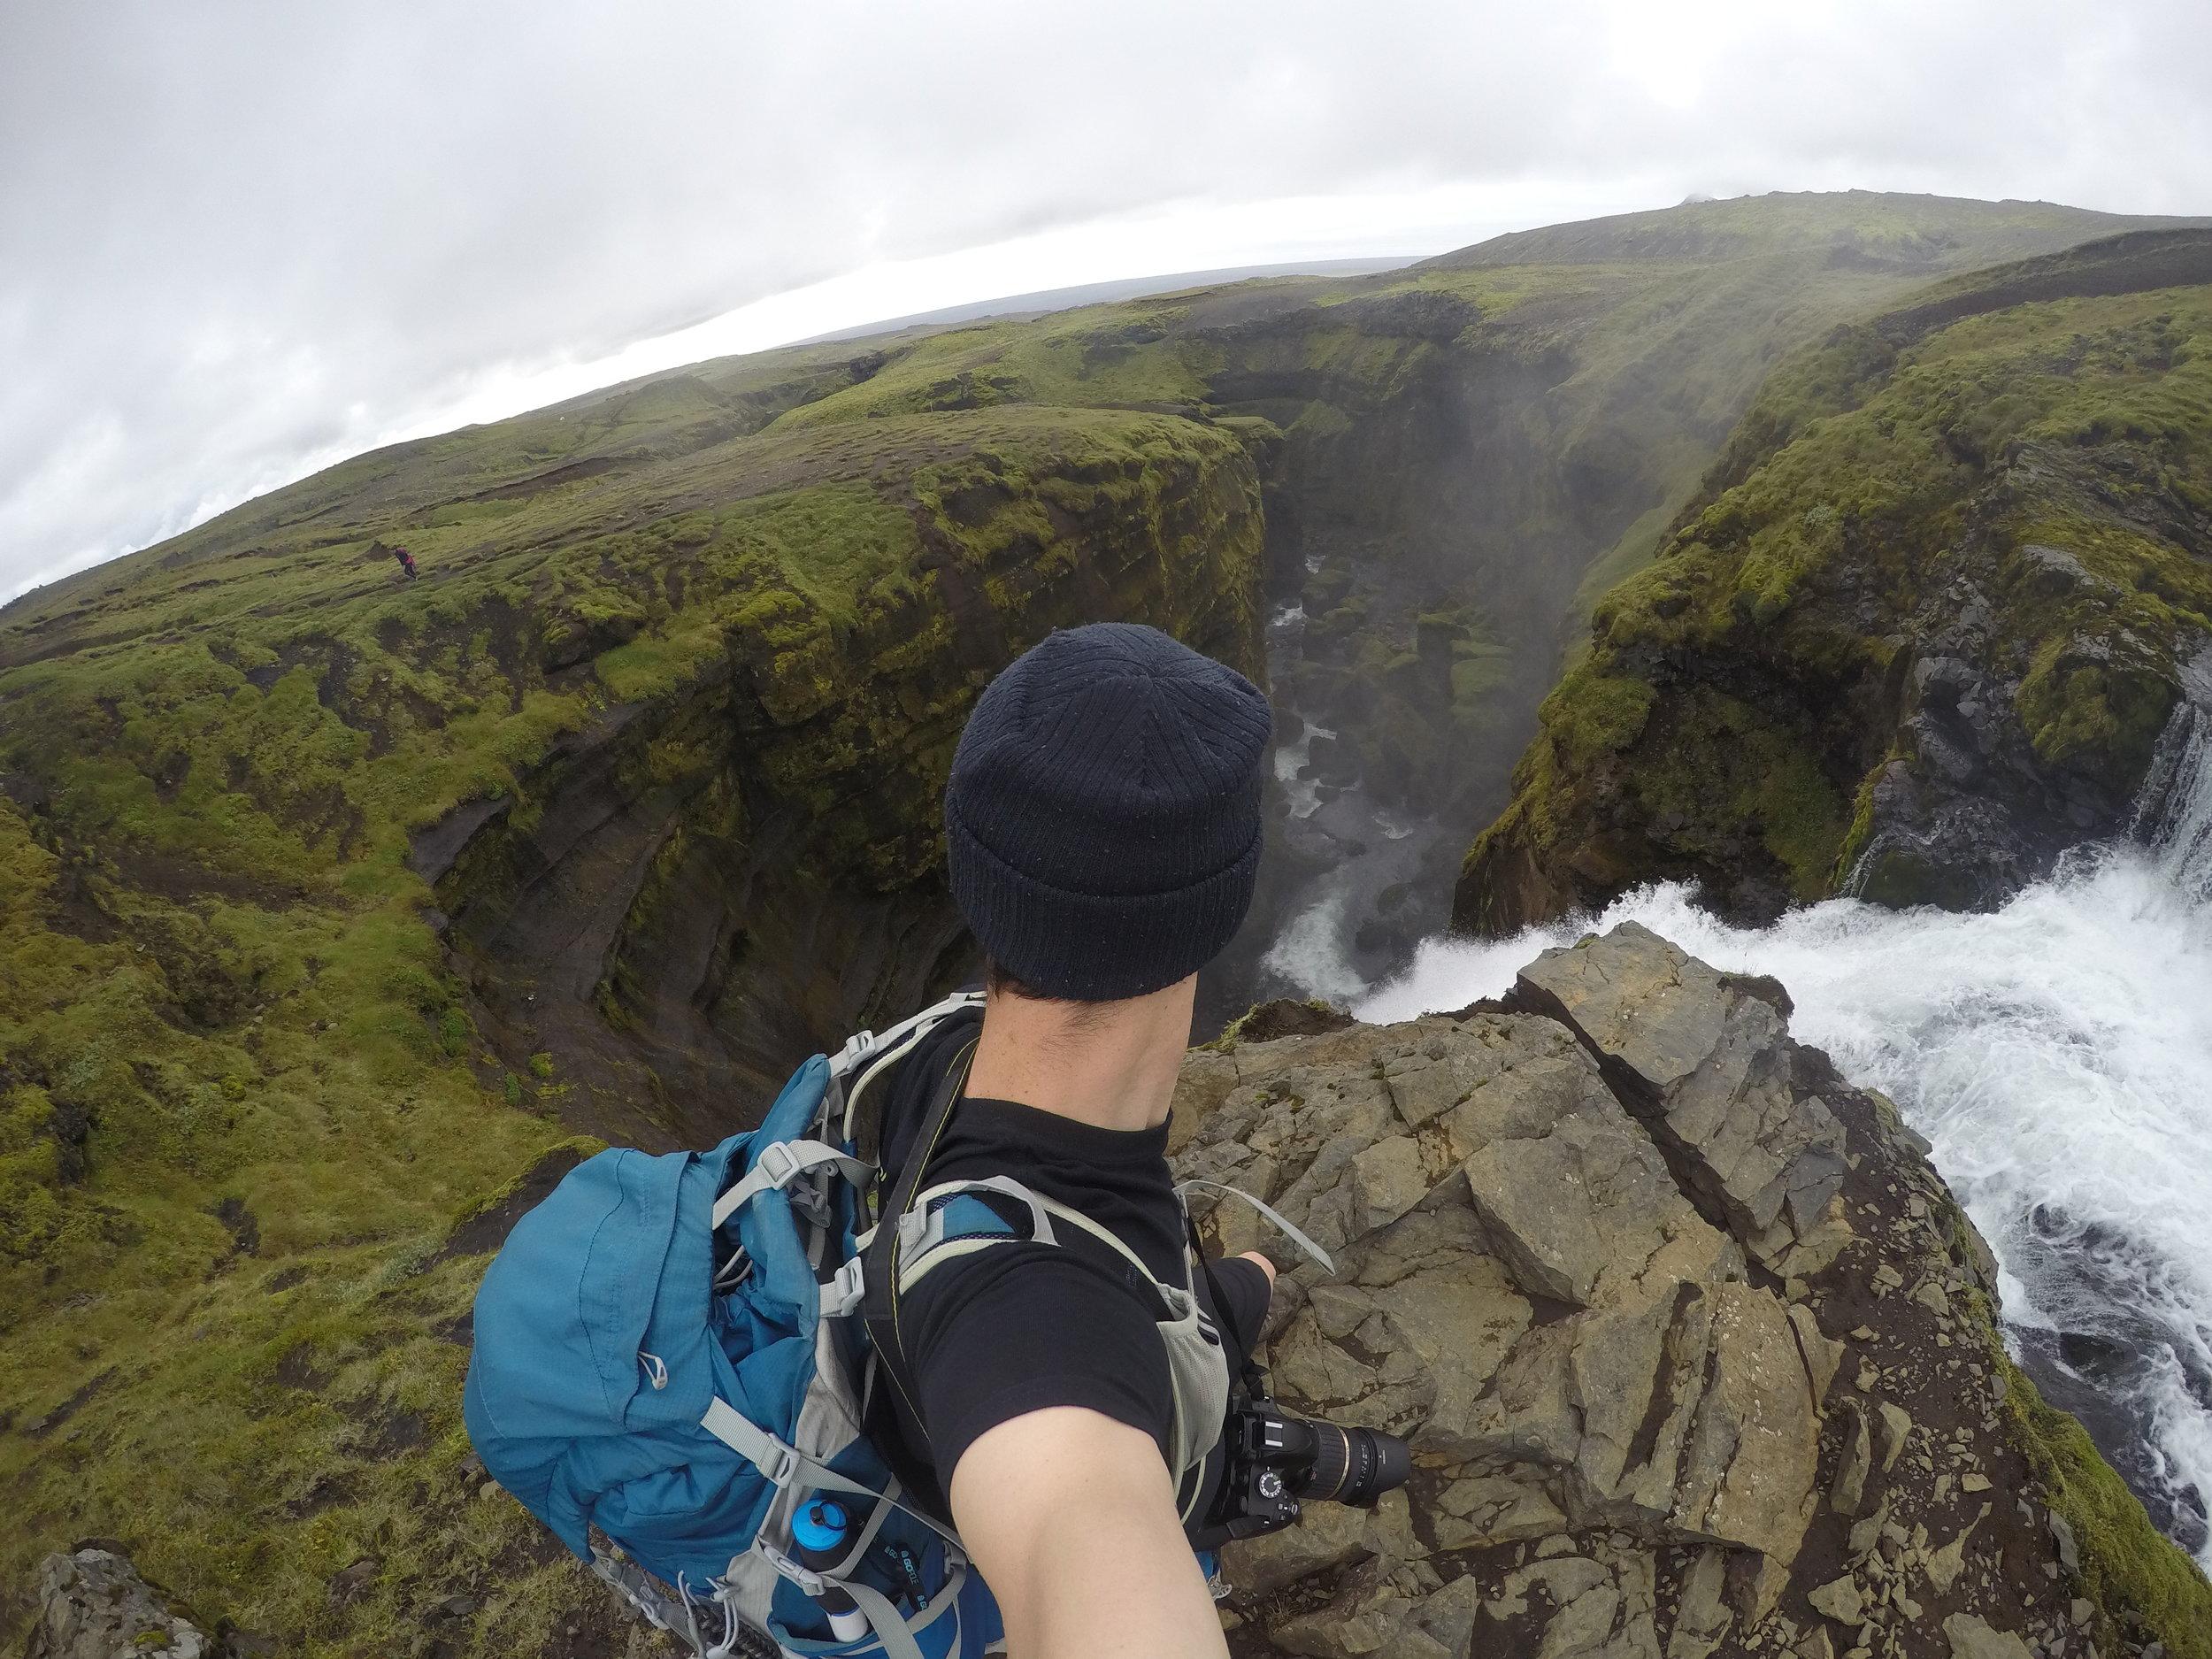 Iceland trip planning. Budget travel Iceland. Backpacking Iceland.